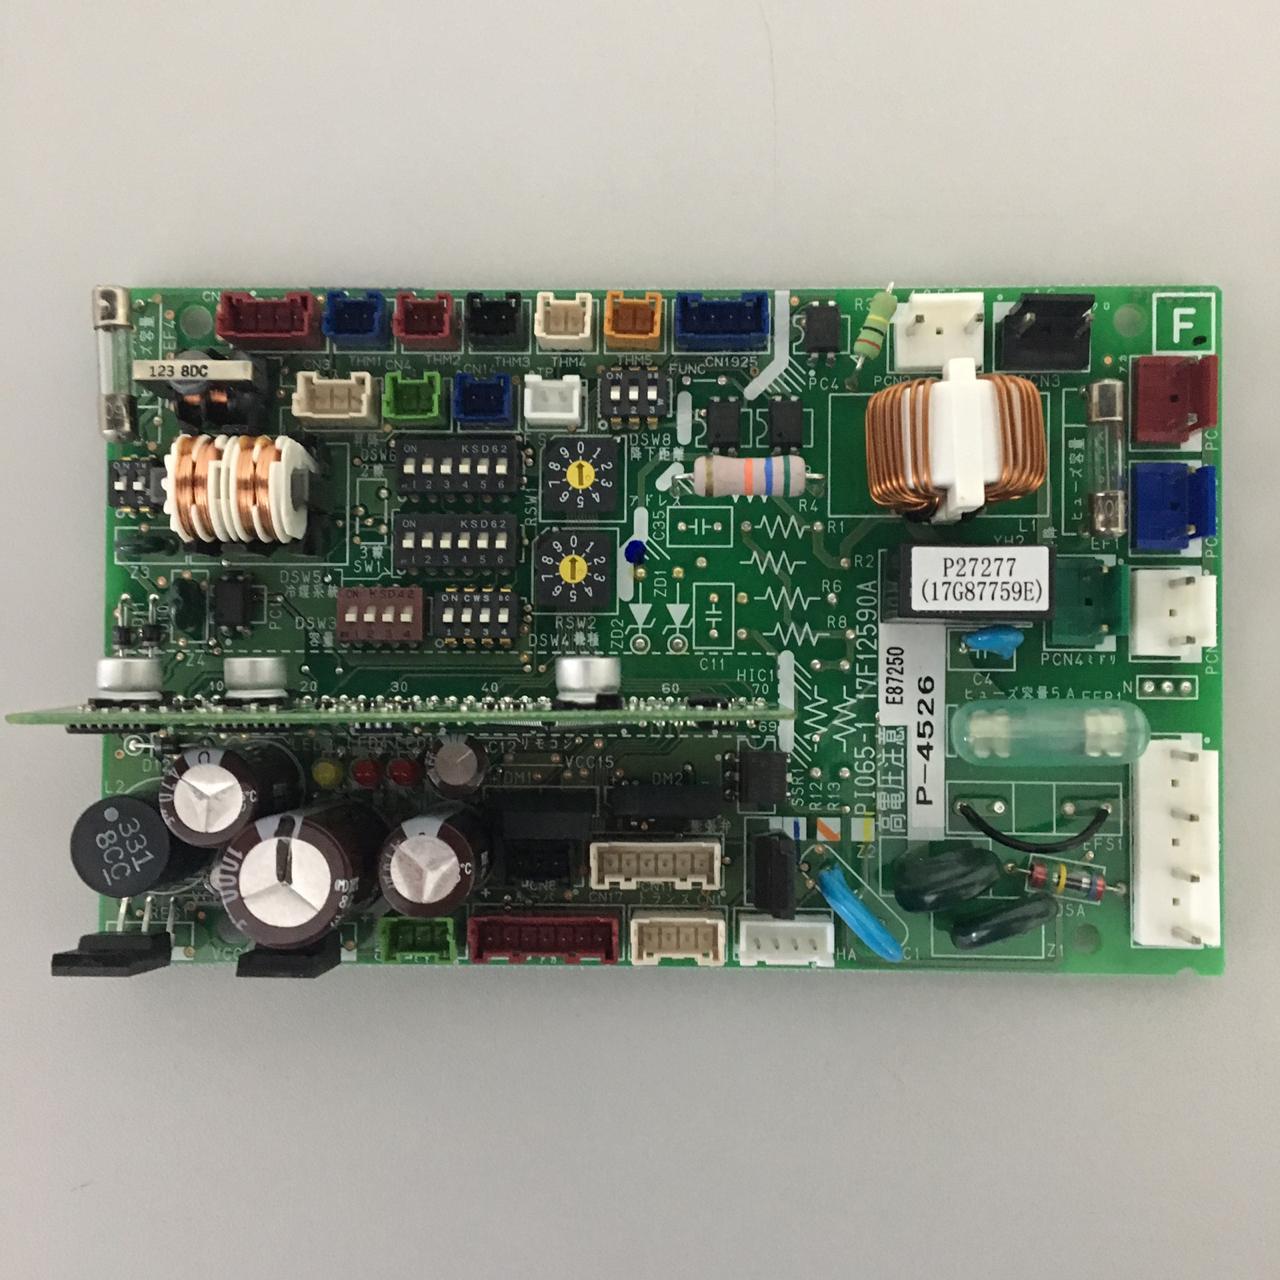 Placa de Circuito PCB Hitachi 17G87759E